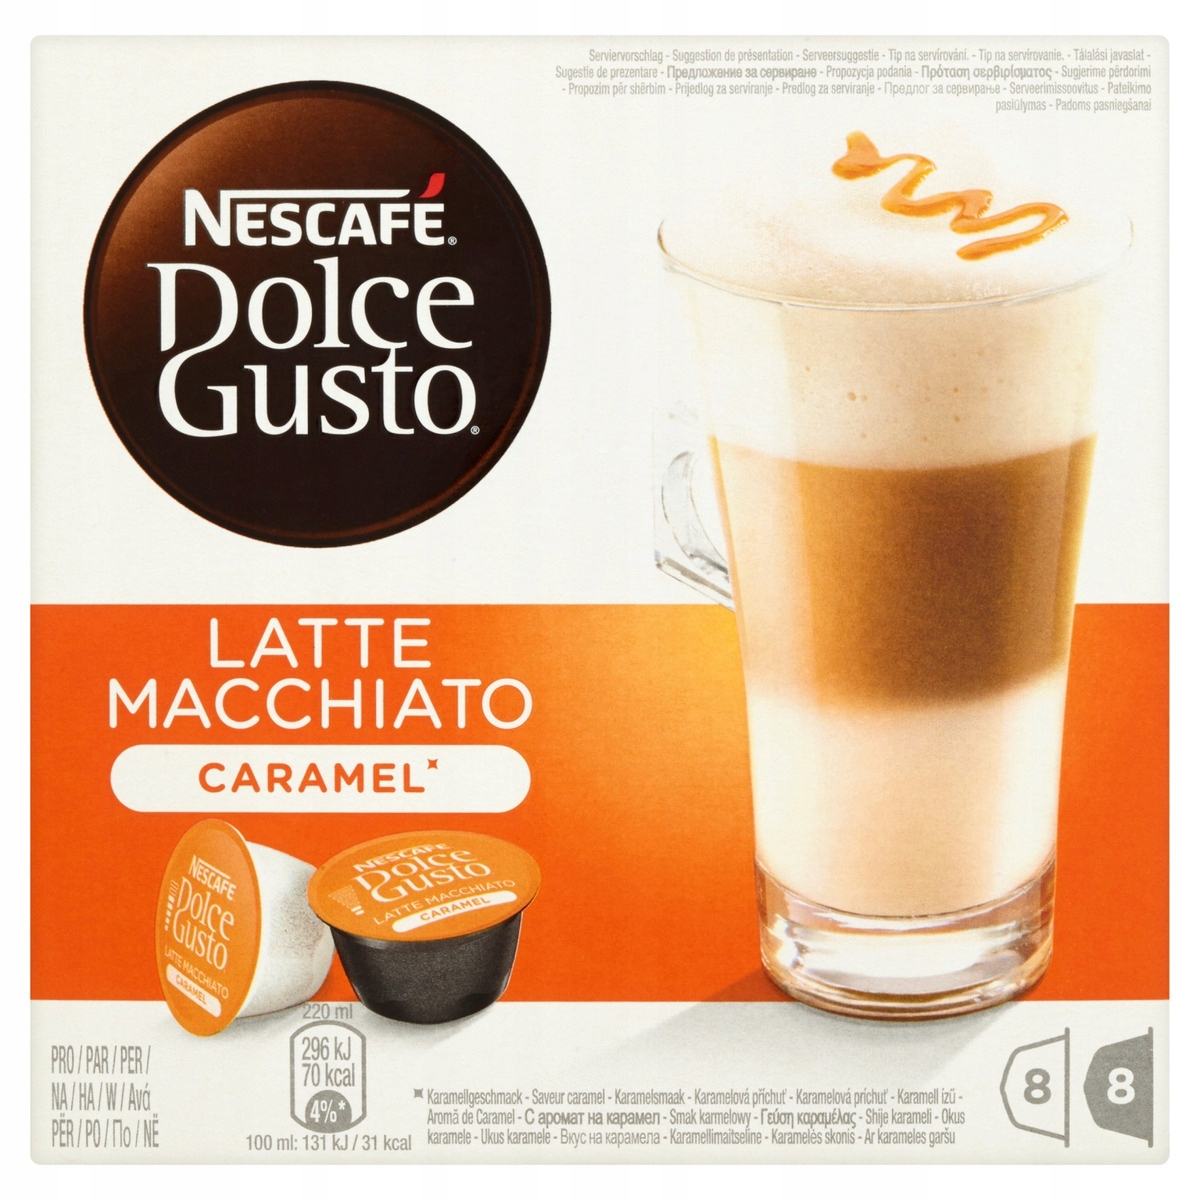 Kapsuły NESCAFE Dolce Gusto Latte Macchiato